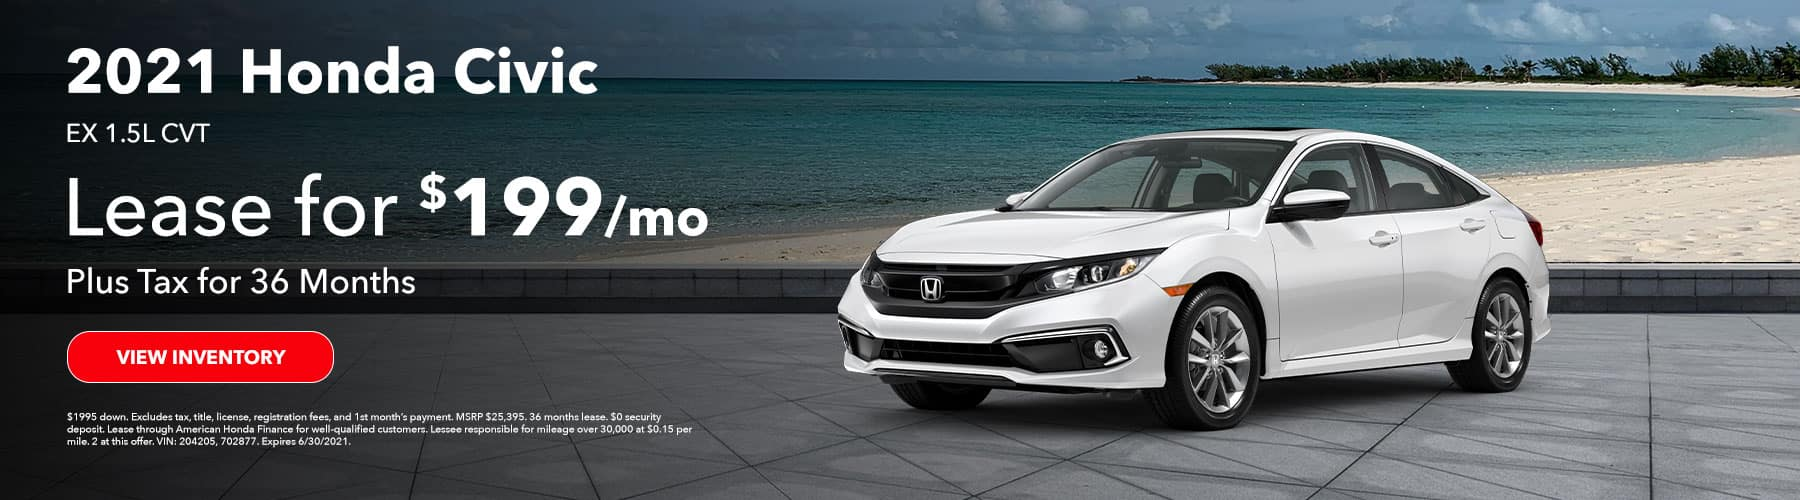 2021 Honda CIVIC EX 1.5L CVT. Lease for $199 plus Tax for 36 Months